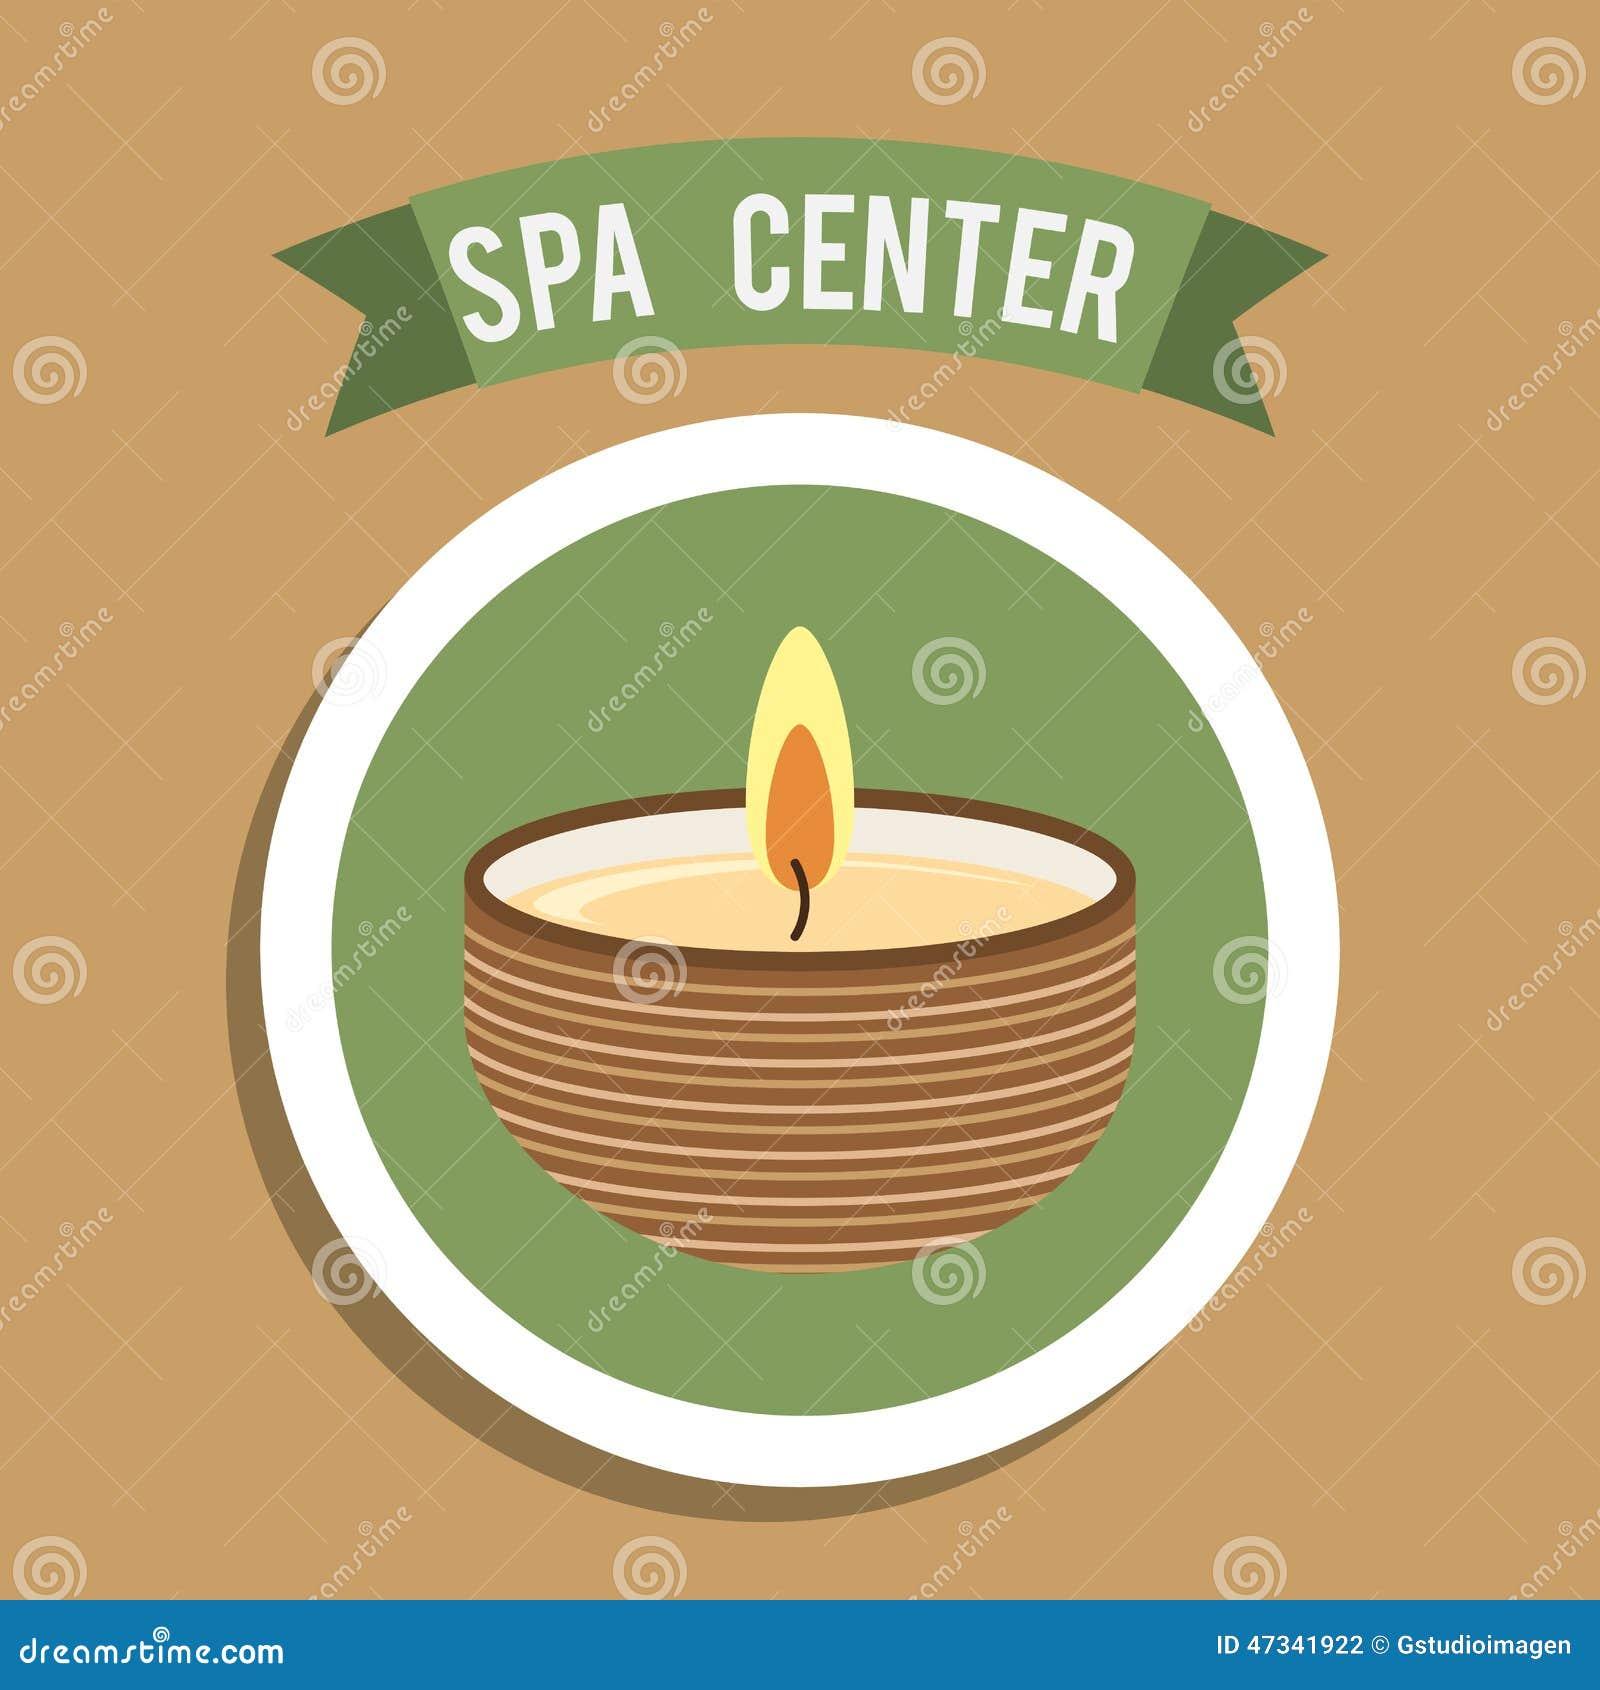 Spa Center Design Vector Illustration